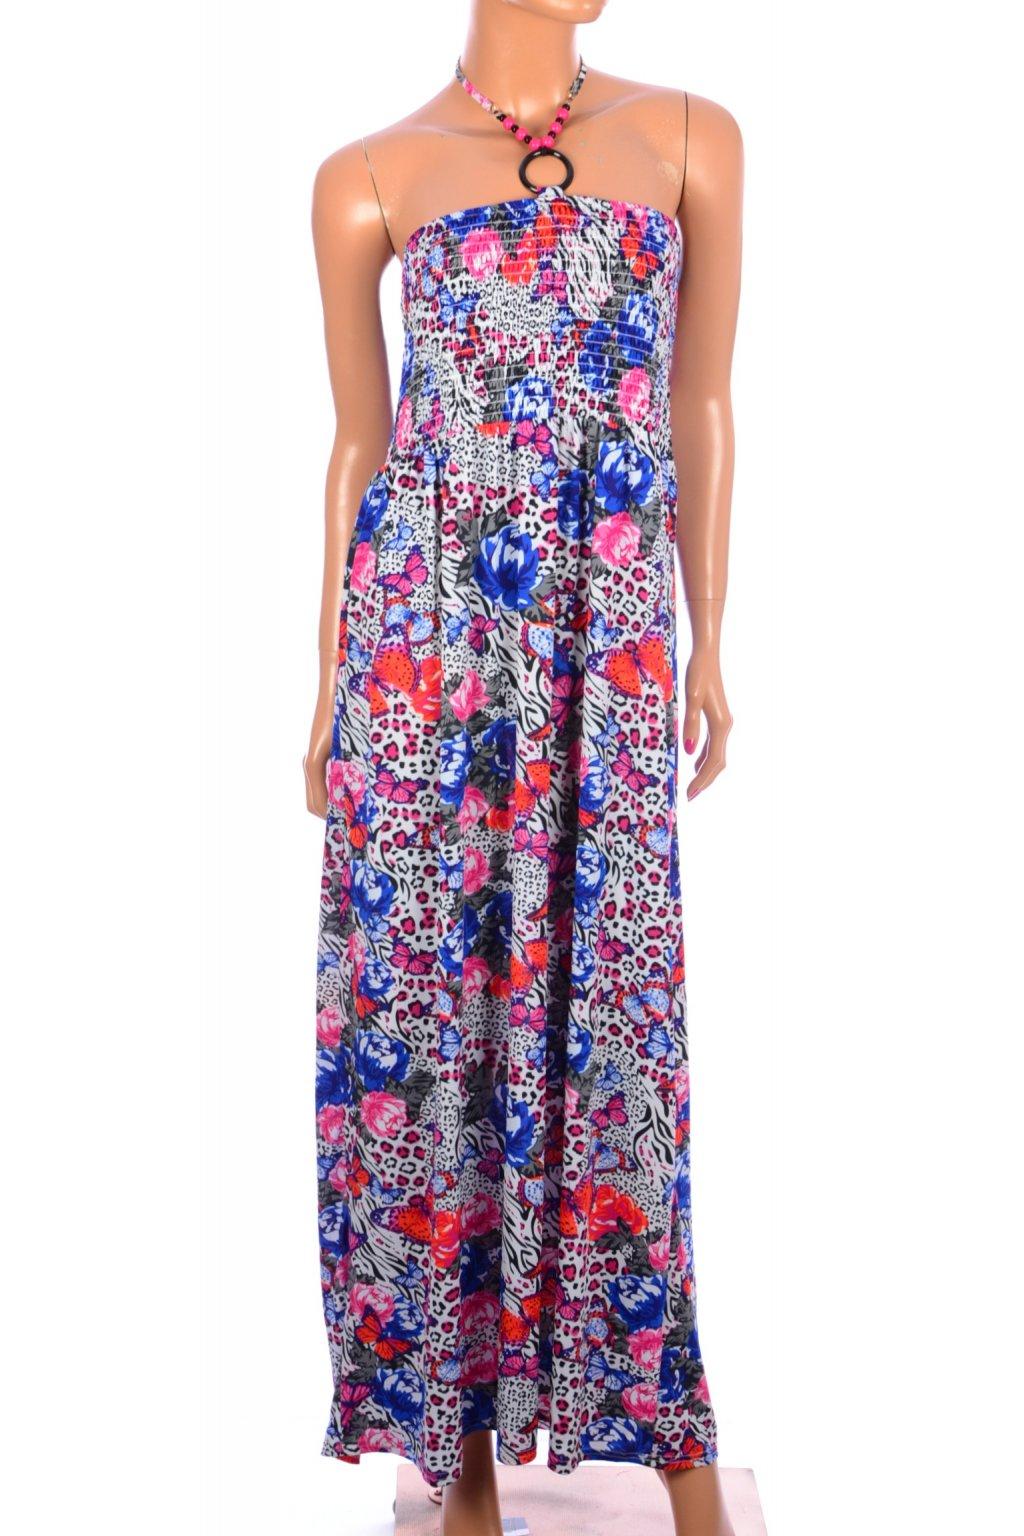 Šaty barevné dlouhé Originals vel. XL